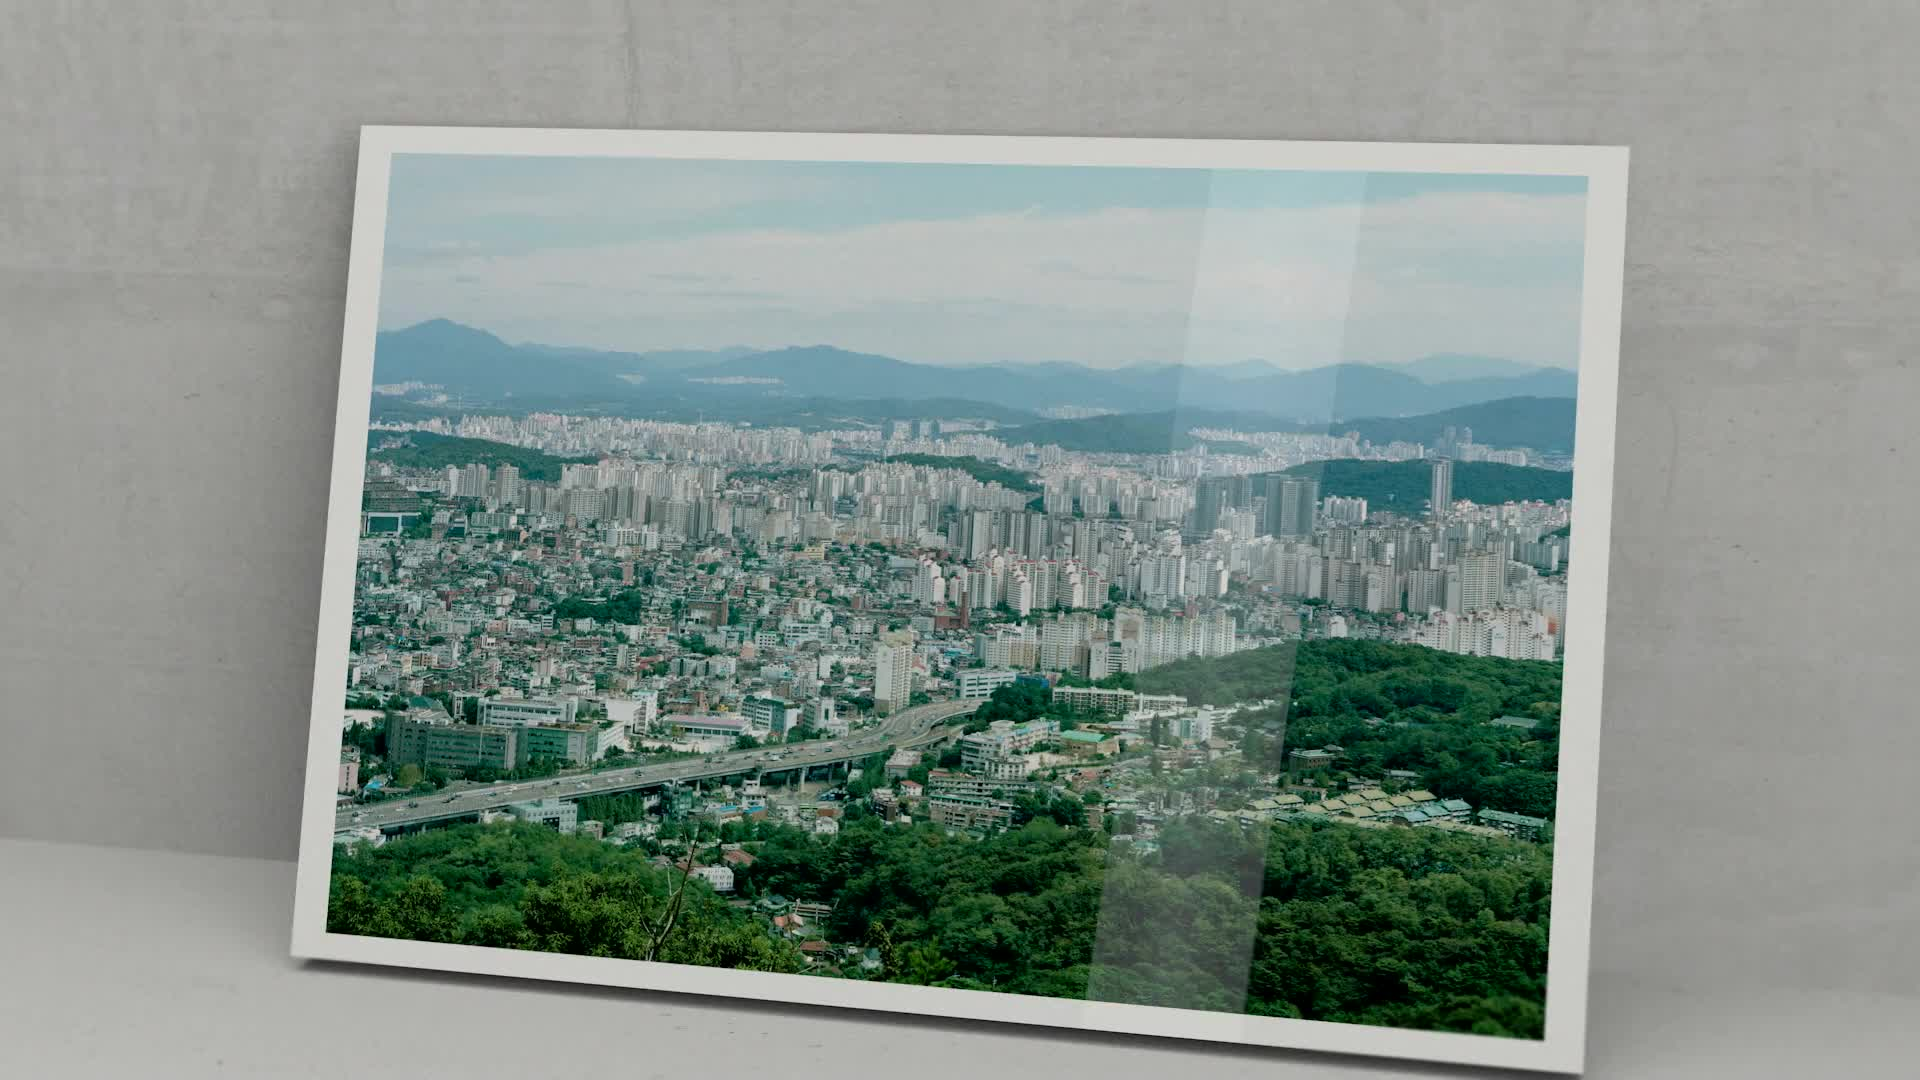 Wallpaper fashion design film city train 3d render